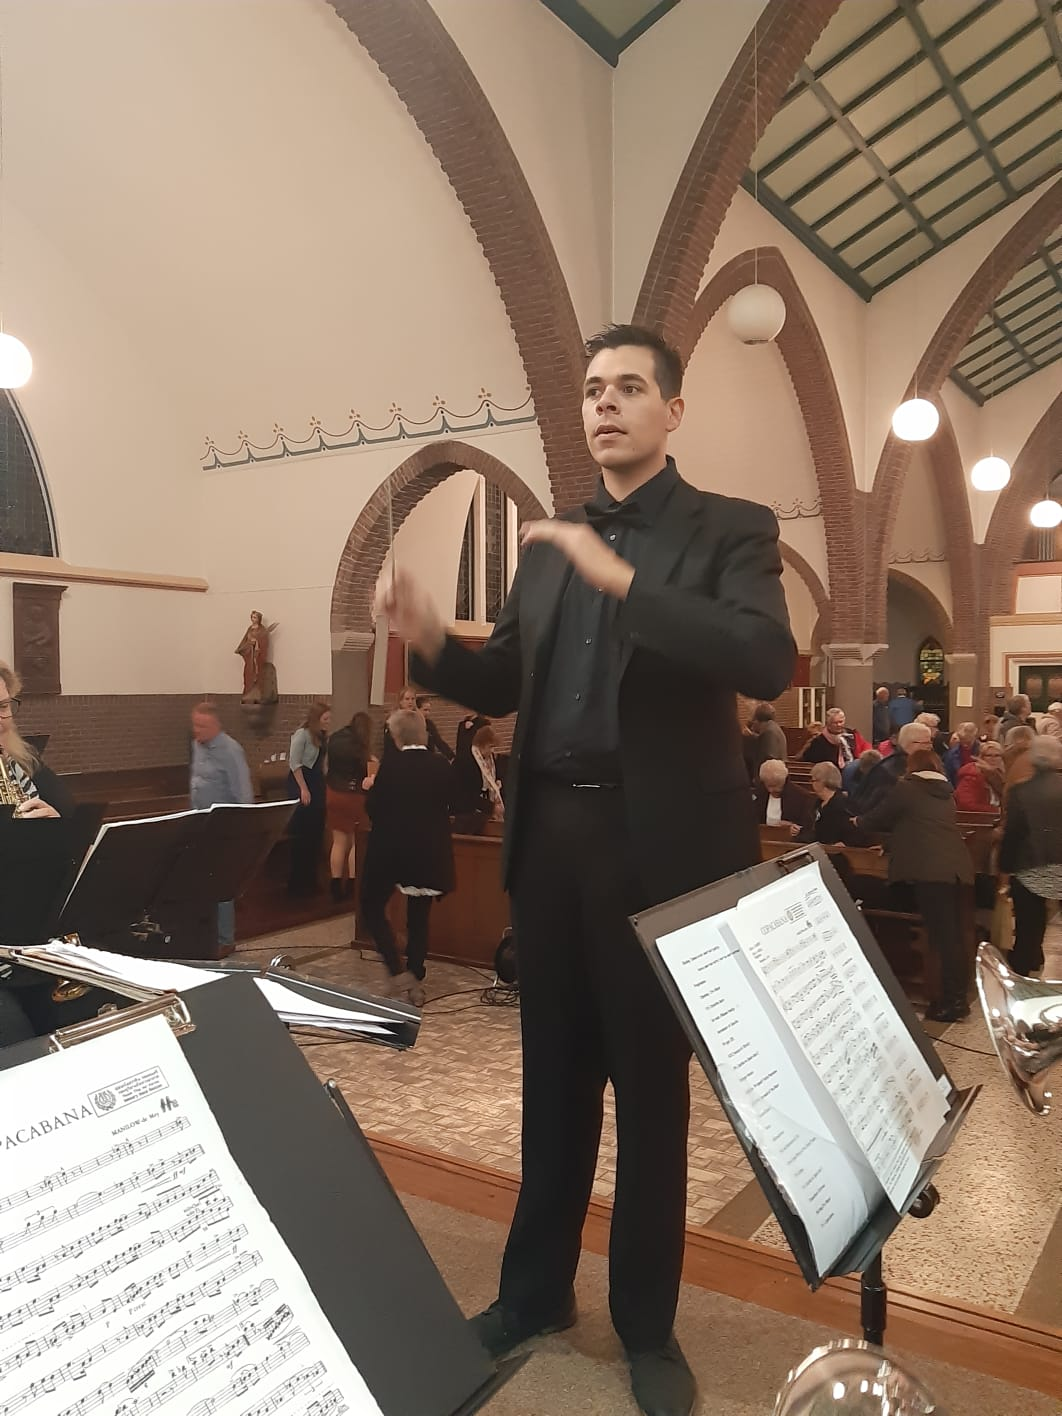 Dirigent Mark